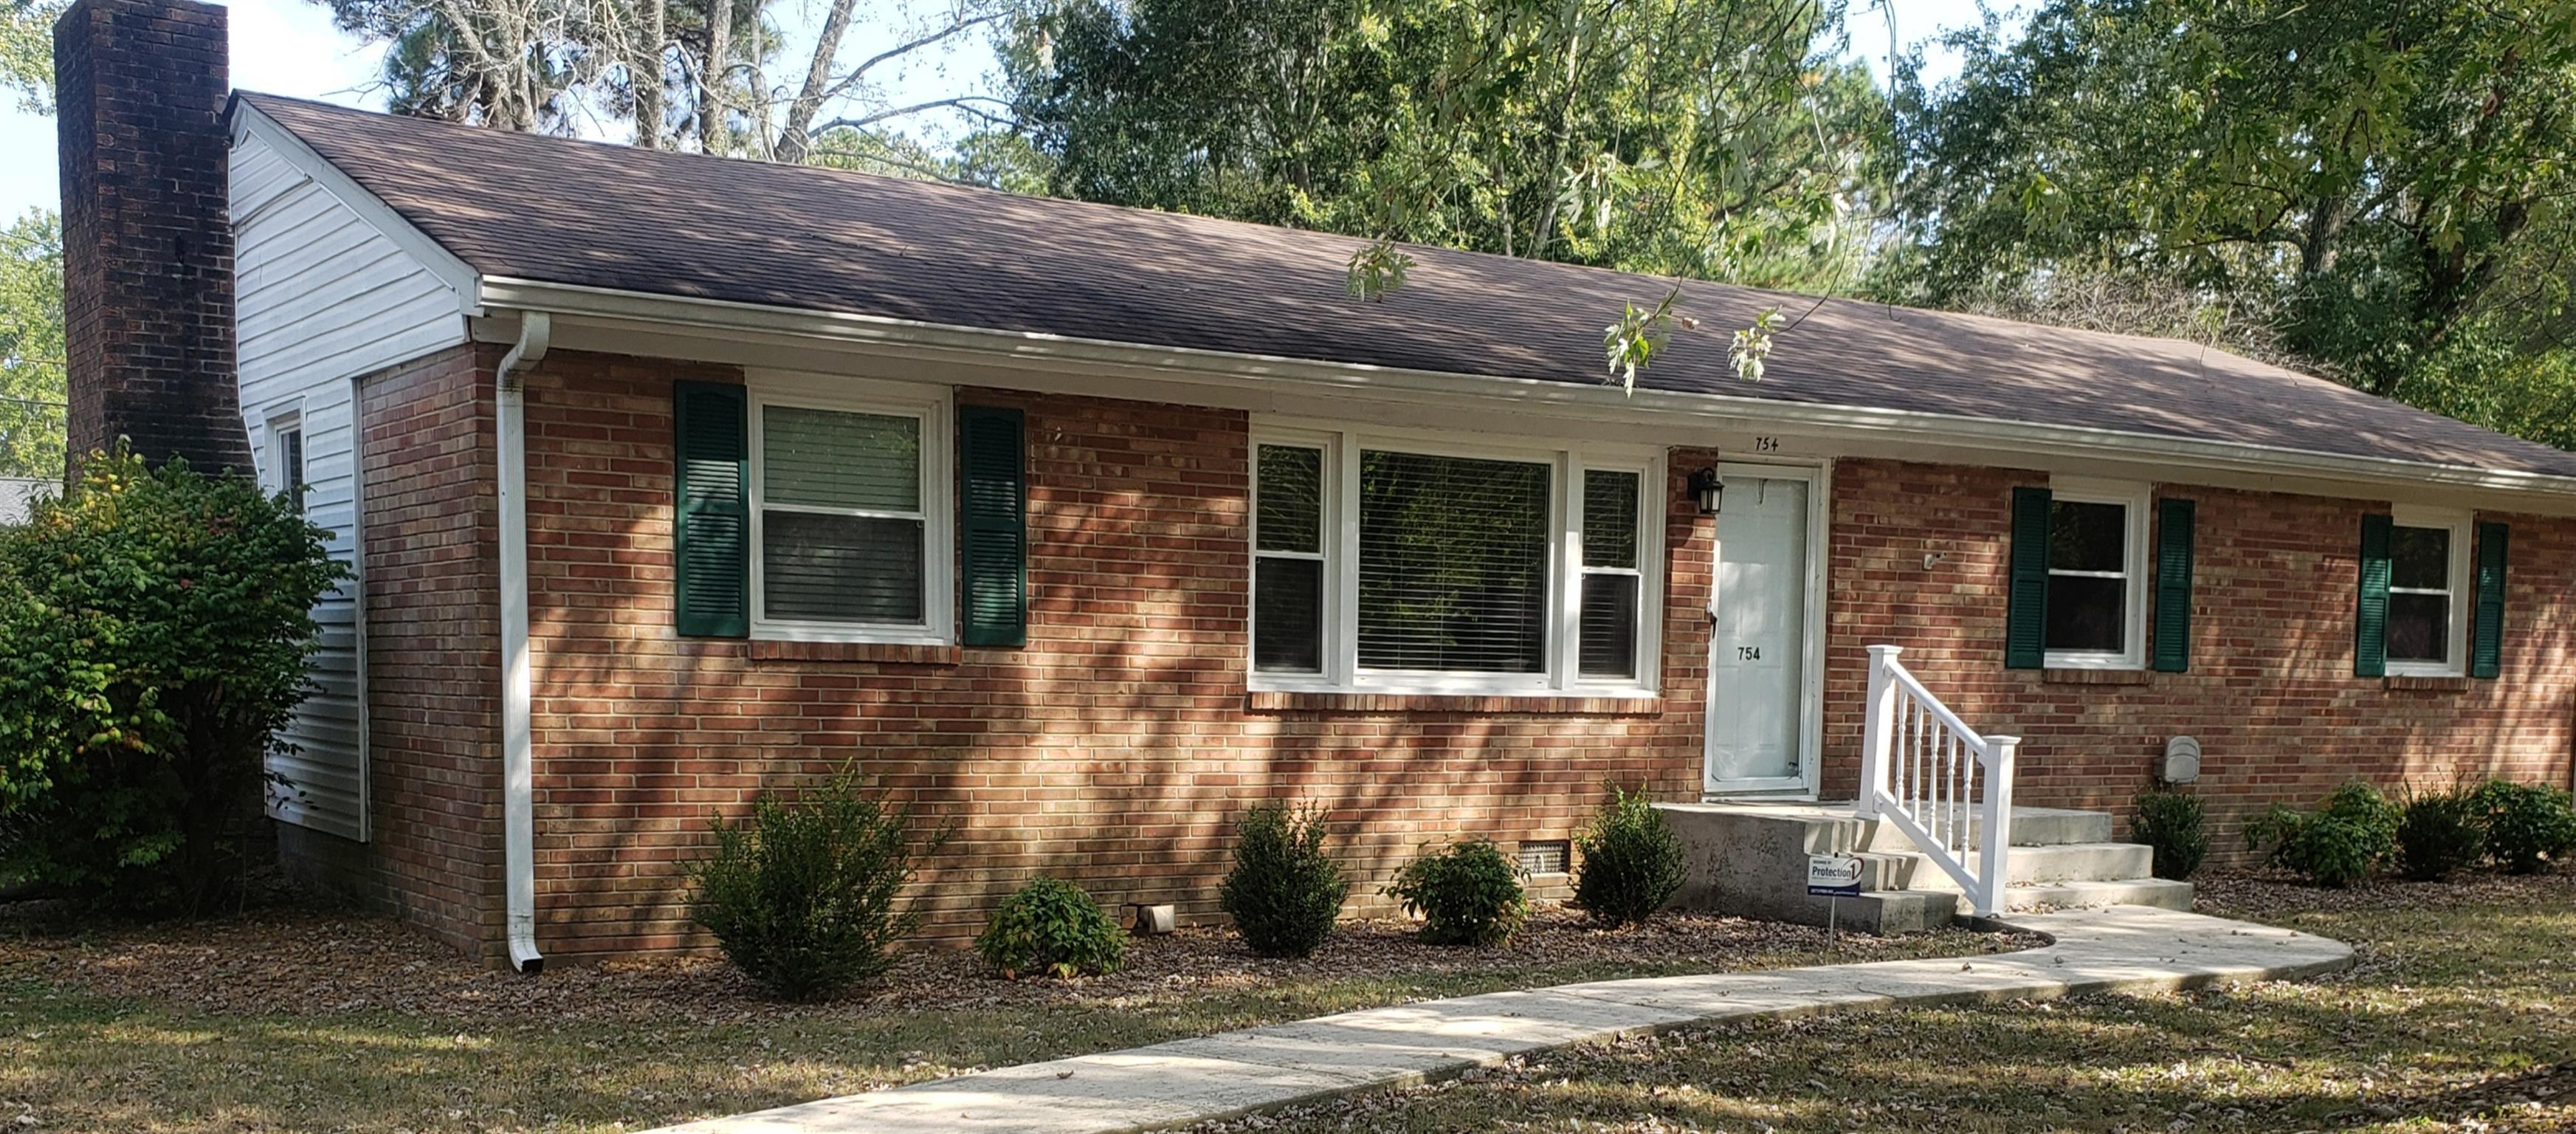 754 Ridgelawn Pl, Tullahoma, TN 37388 - Tullahoma, TN real estate listing